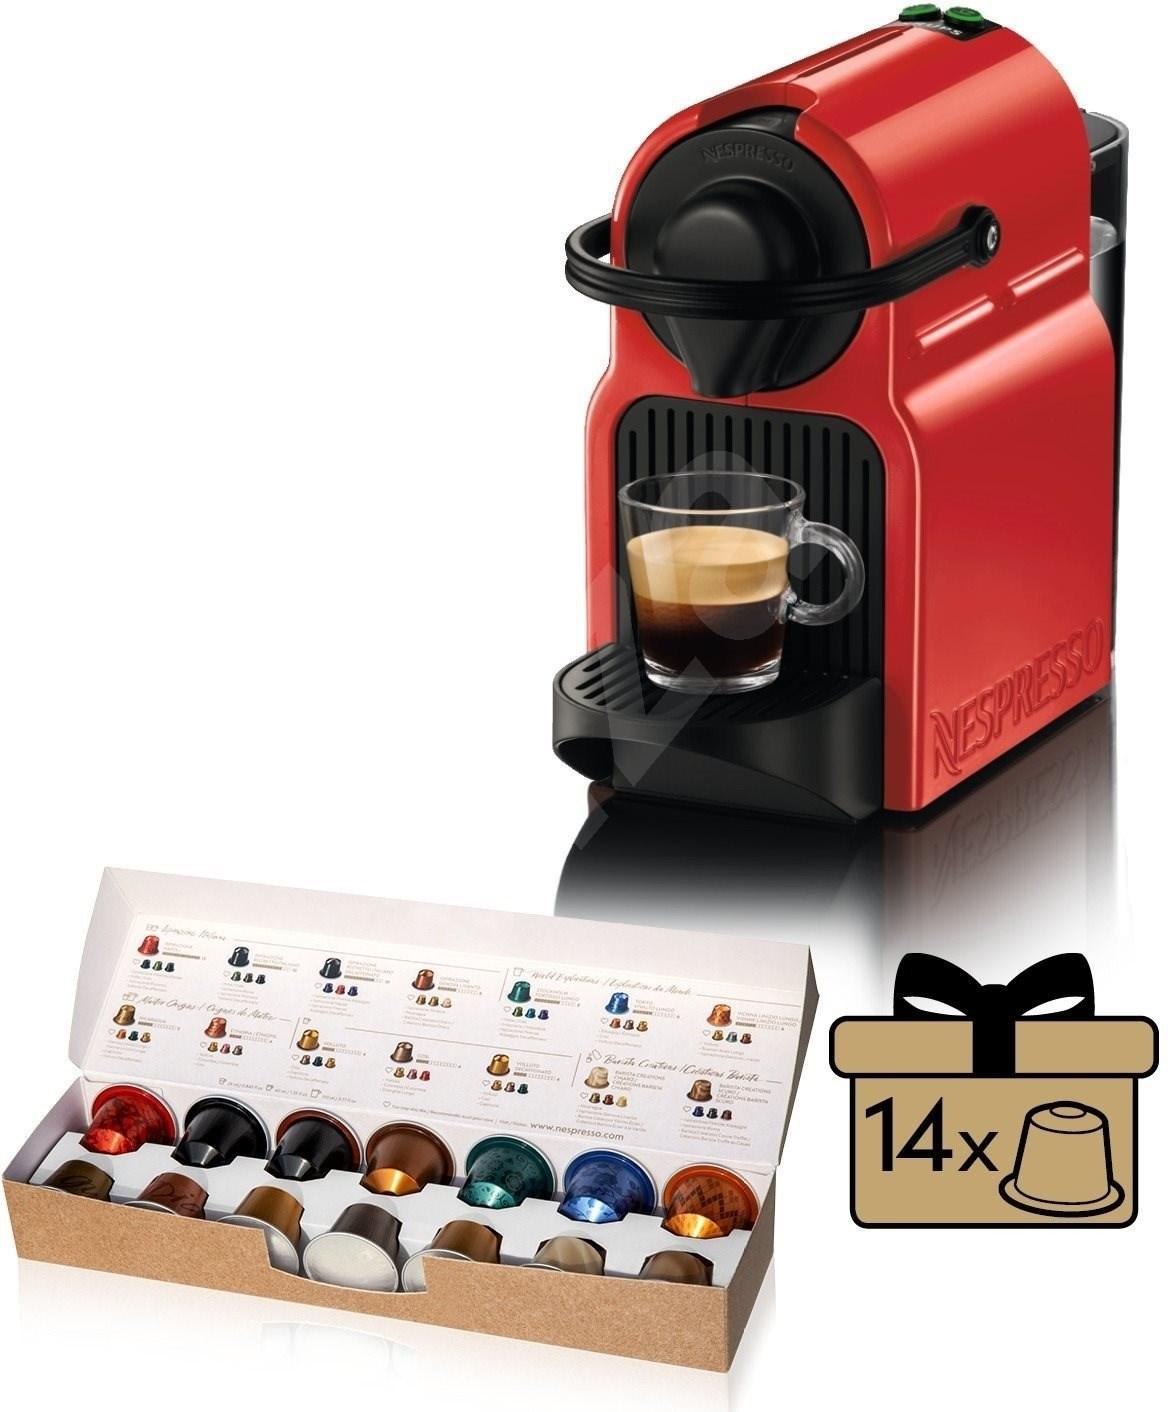 nespresso krups inissia xn100510 automatic coffee. Black Bedroom Furniture Sets. Home Design Ideas